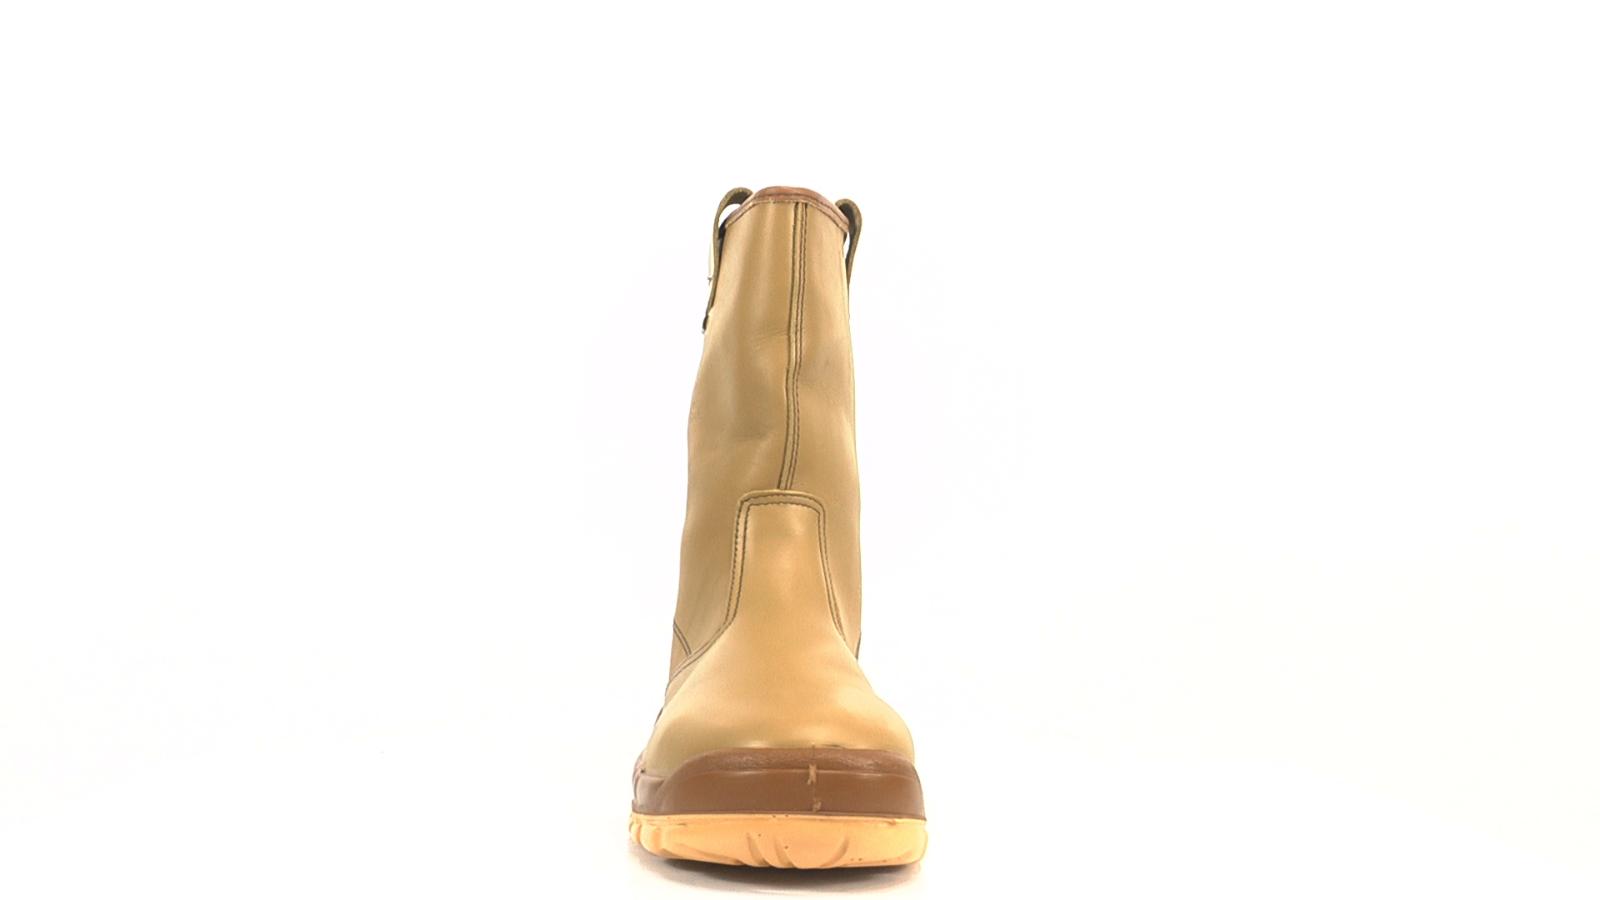 Jallatte Jalhaka Rigger Boot omposite Toe Cap and Midsole Metal Free J0650 Pre